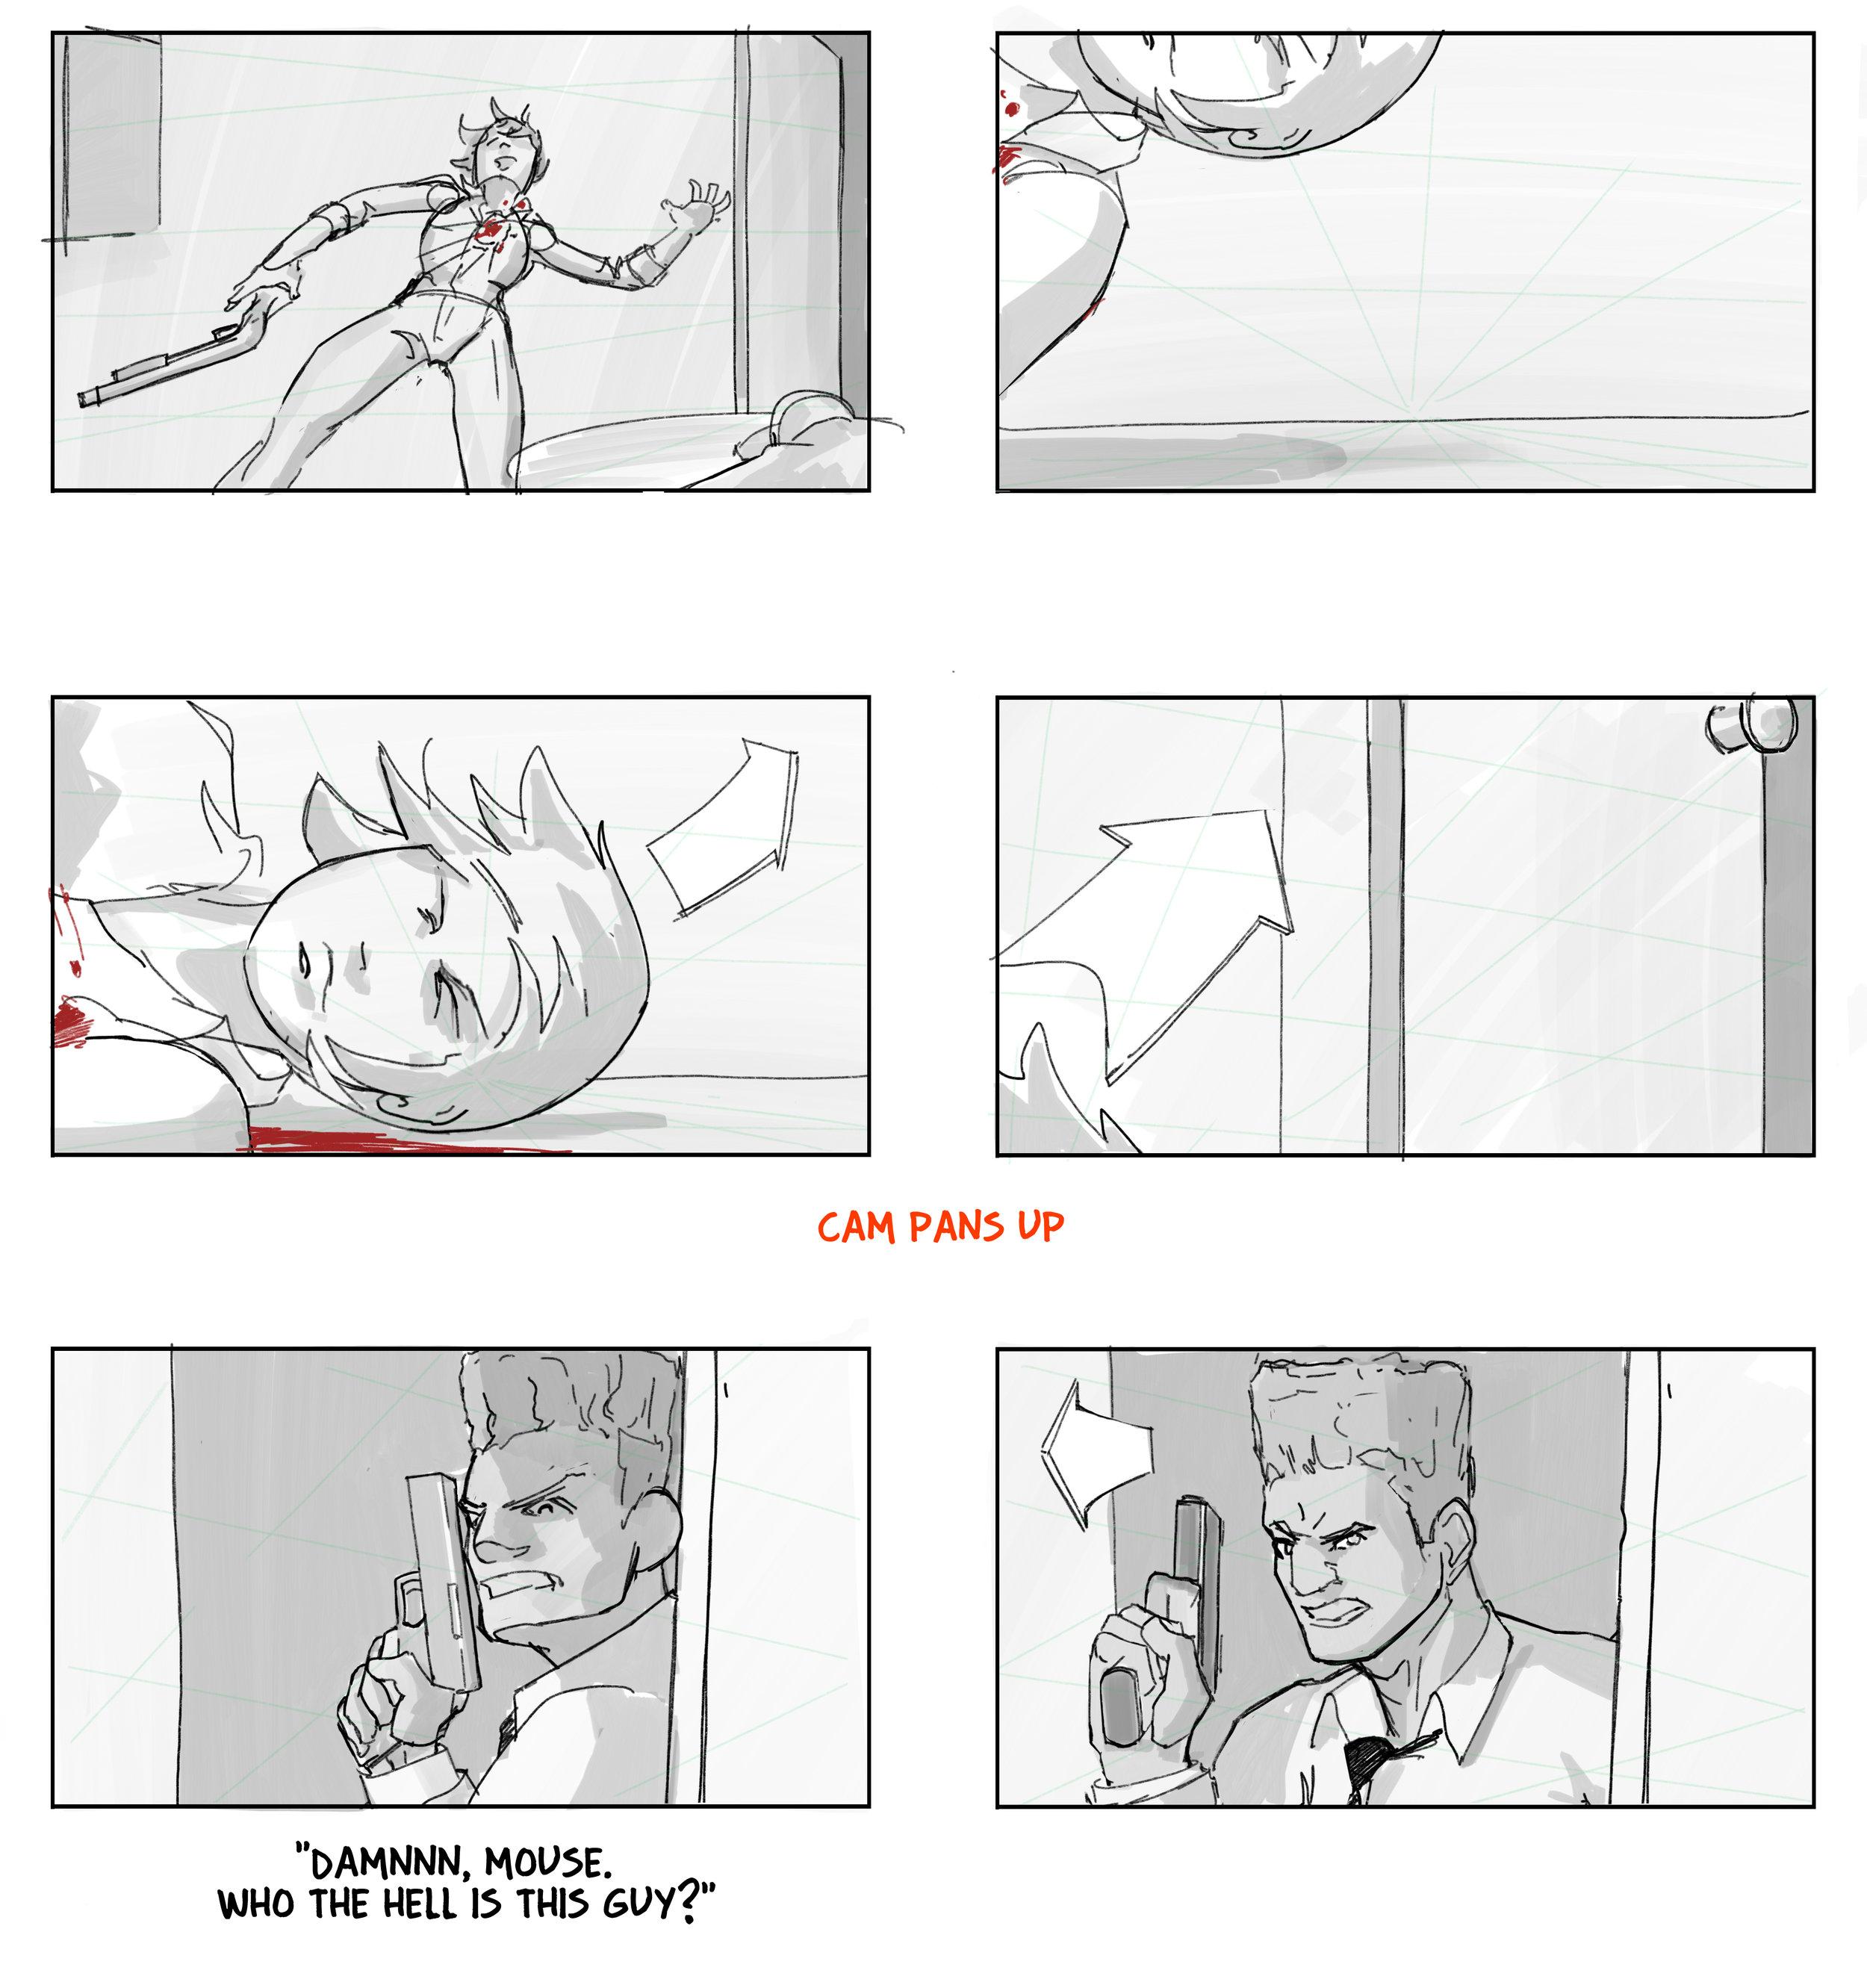 SAM_BS_Catapano_Storyboards_013.jpg